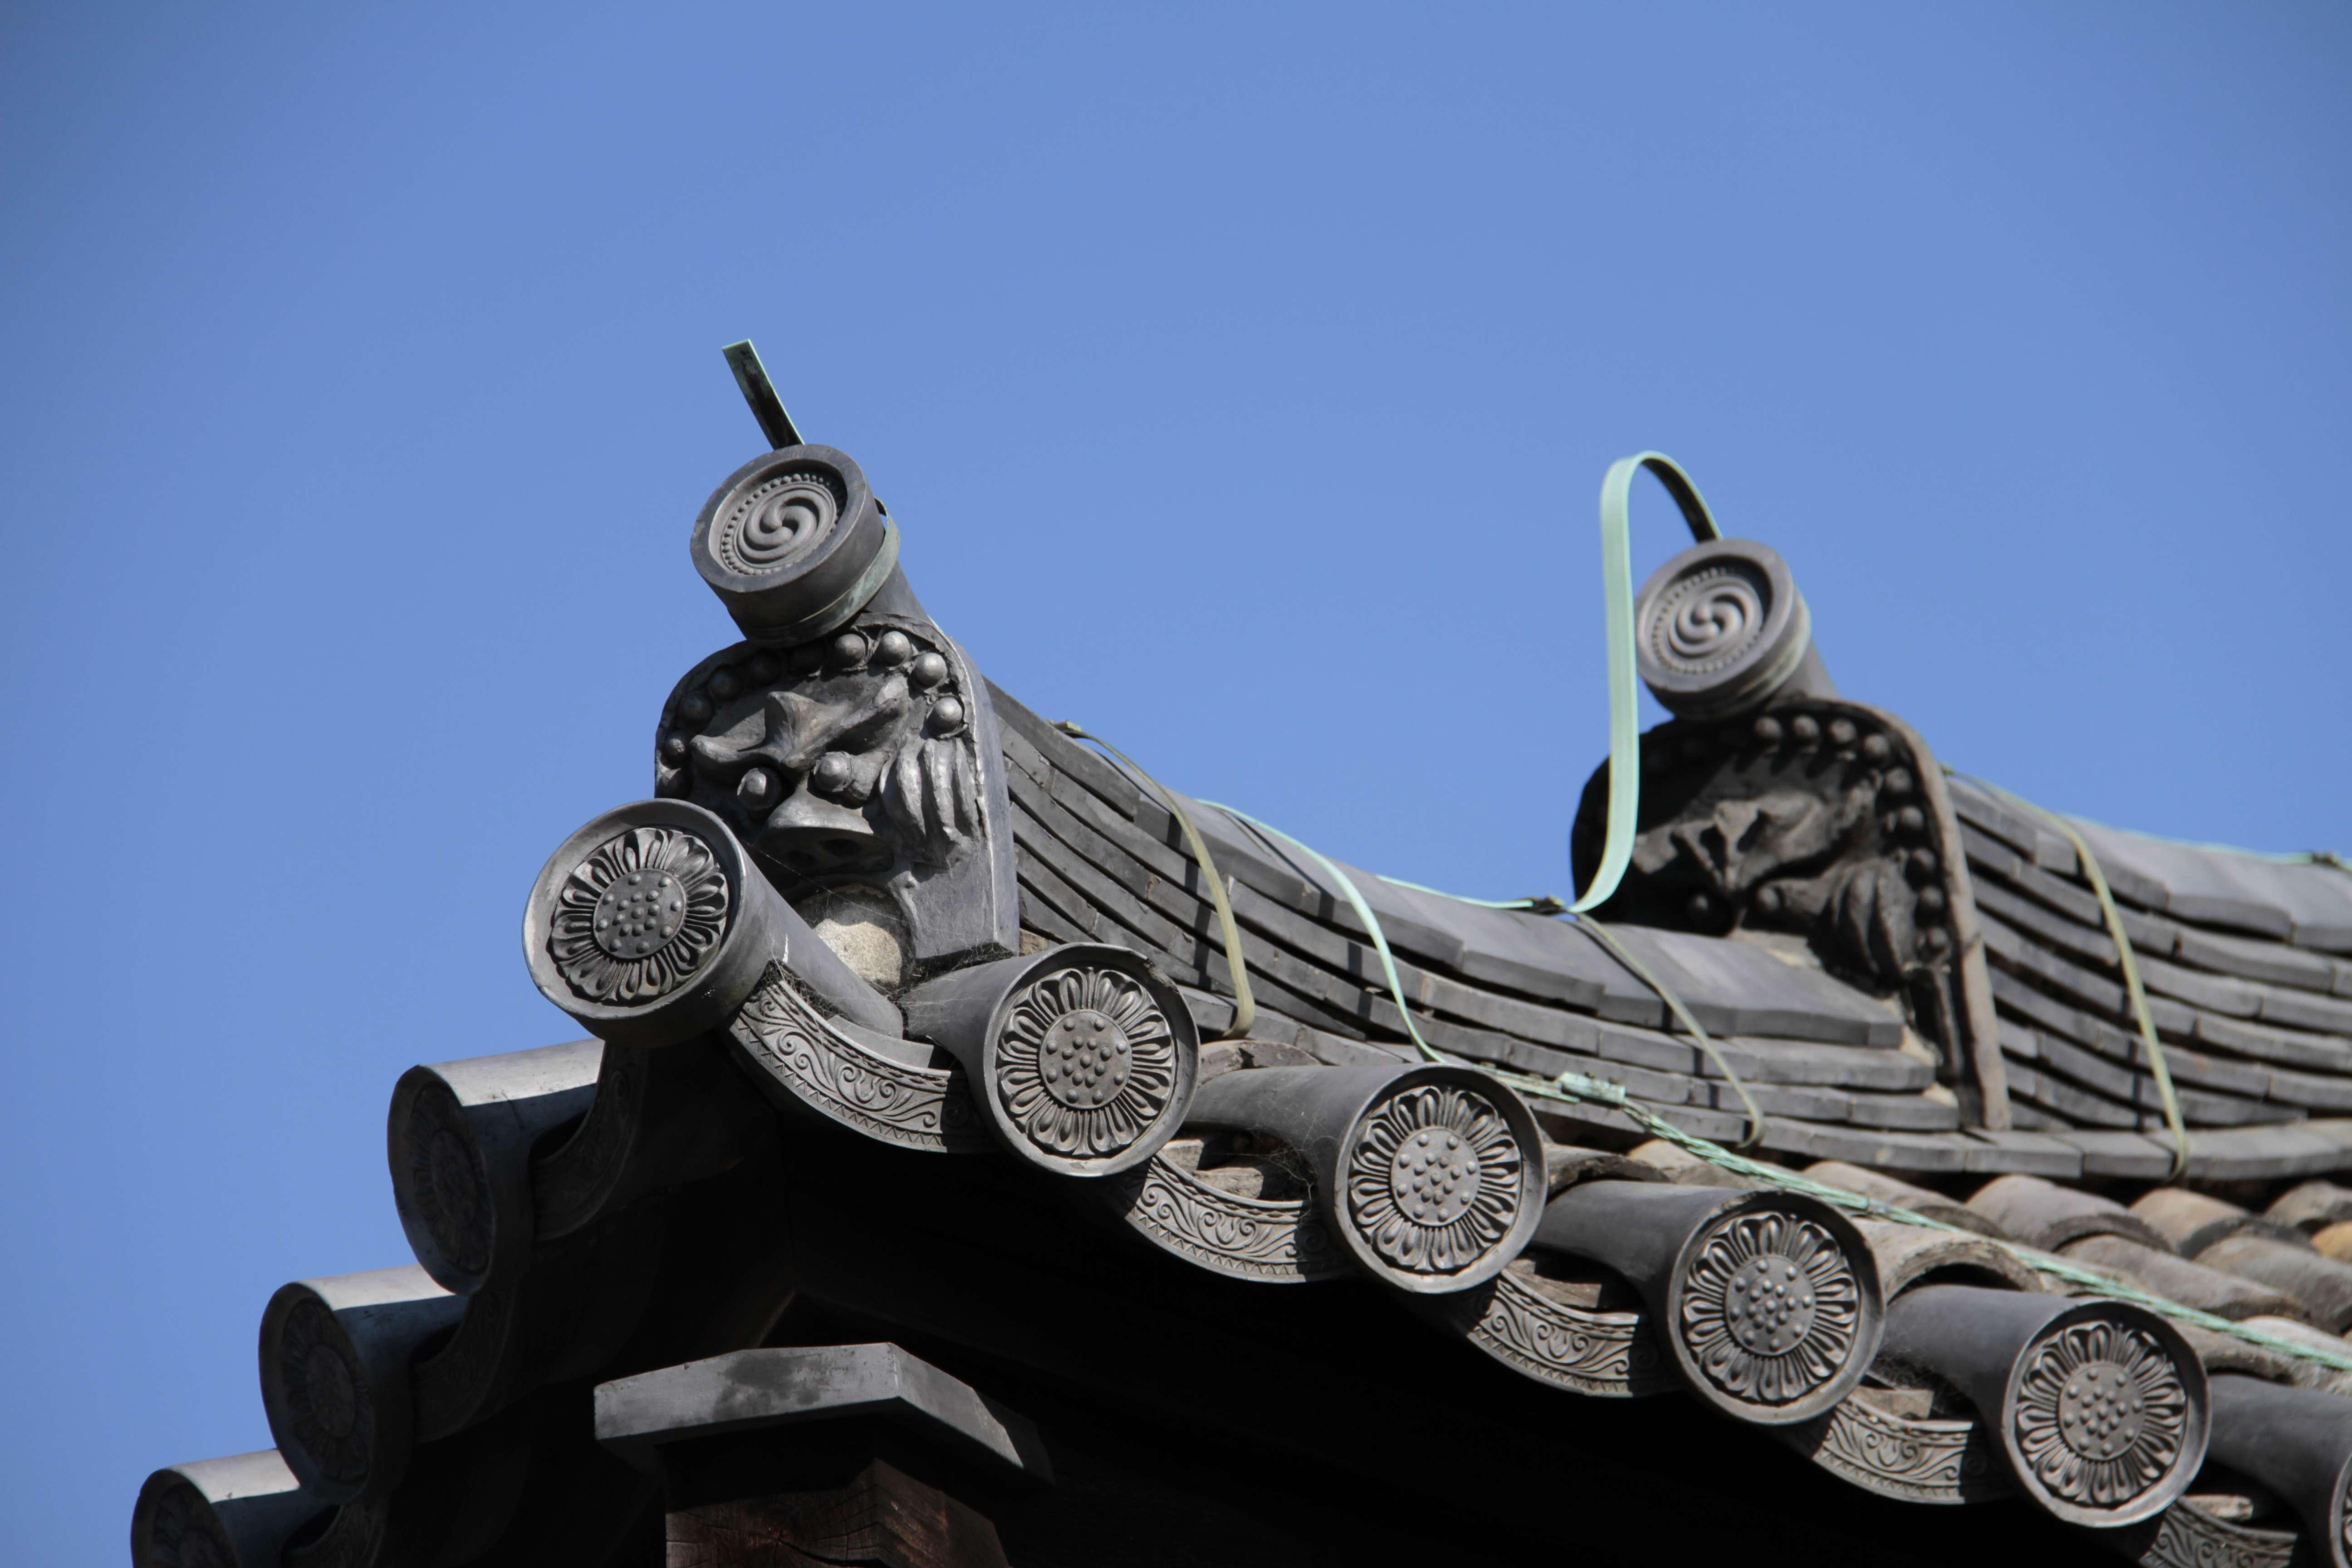 Japon avril 2017_0462 Nara temple bouddhiste Gango ji